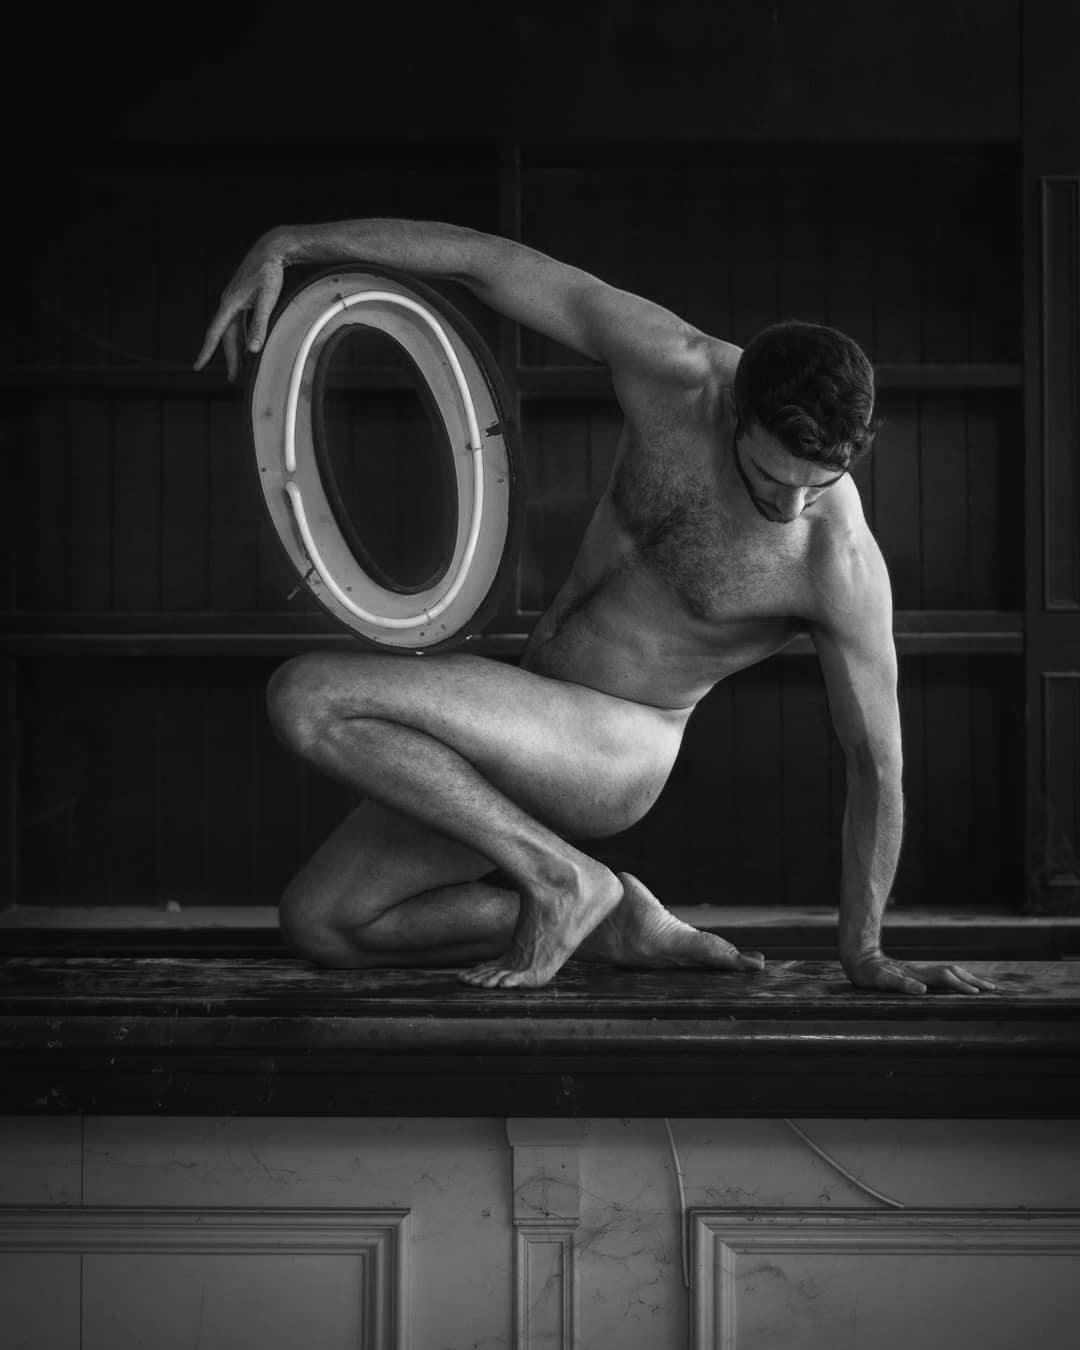 OlympiaN, by SansSerifit ft Boaz Lev Nelson Levy